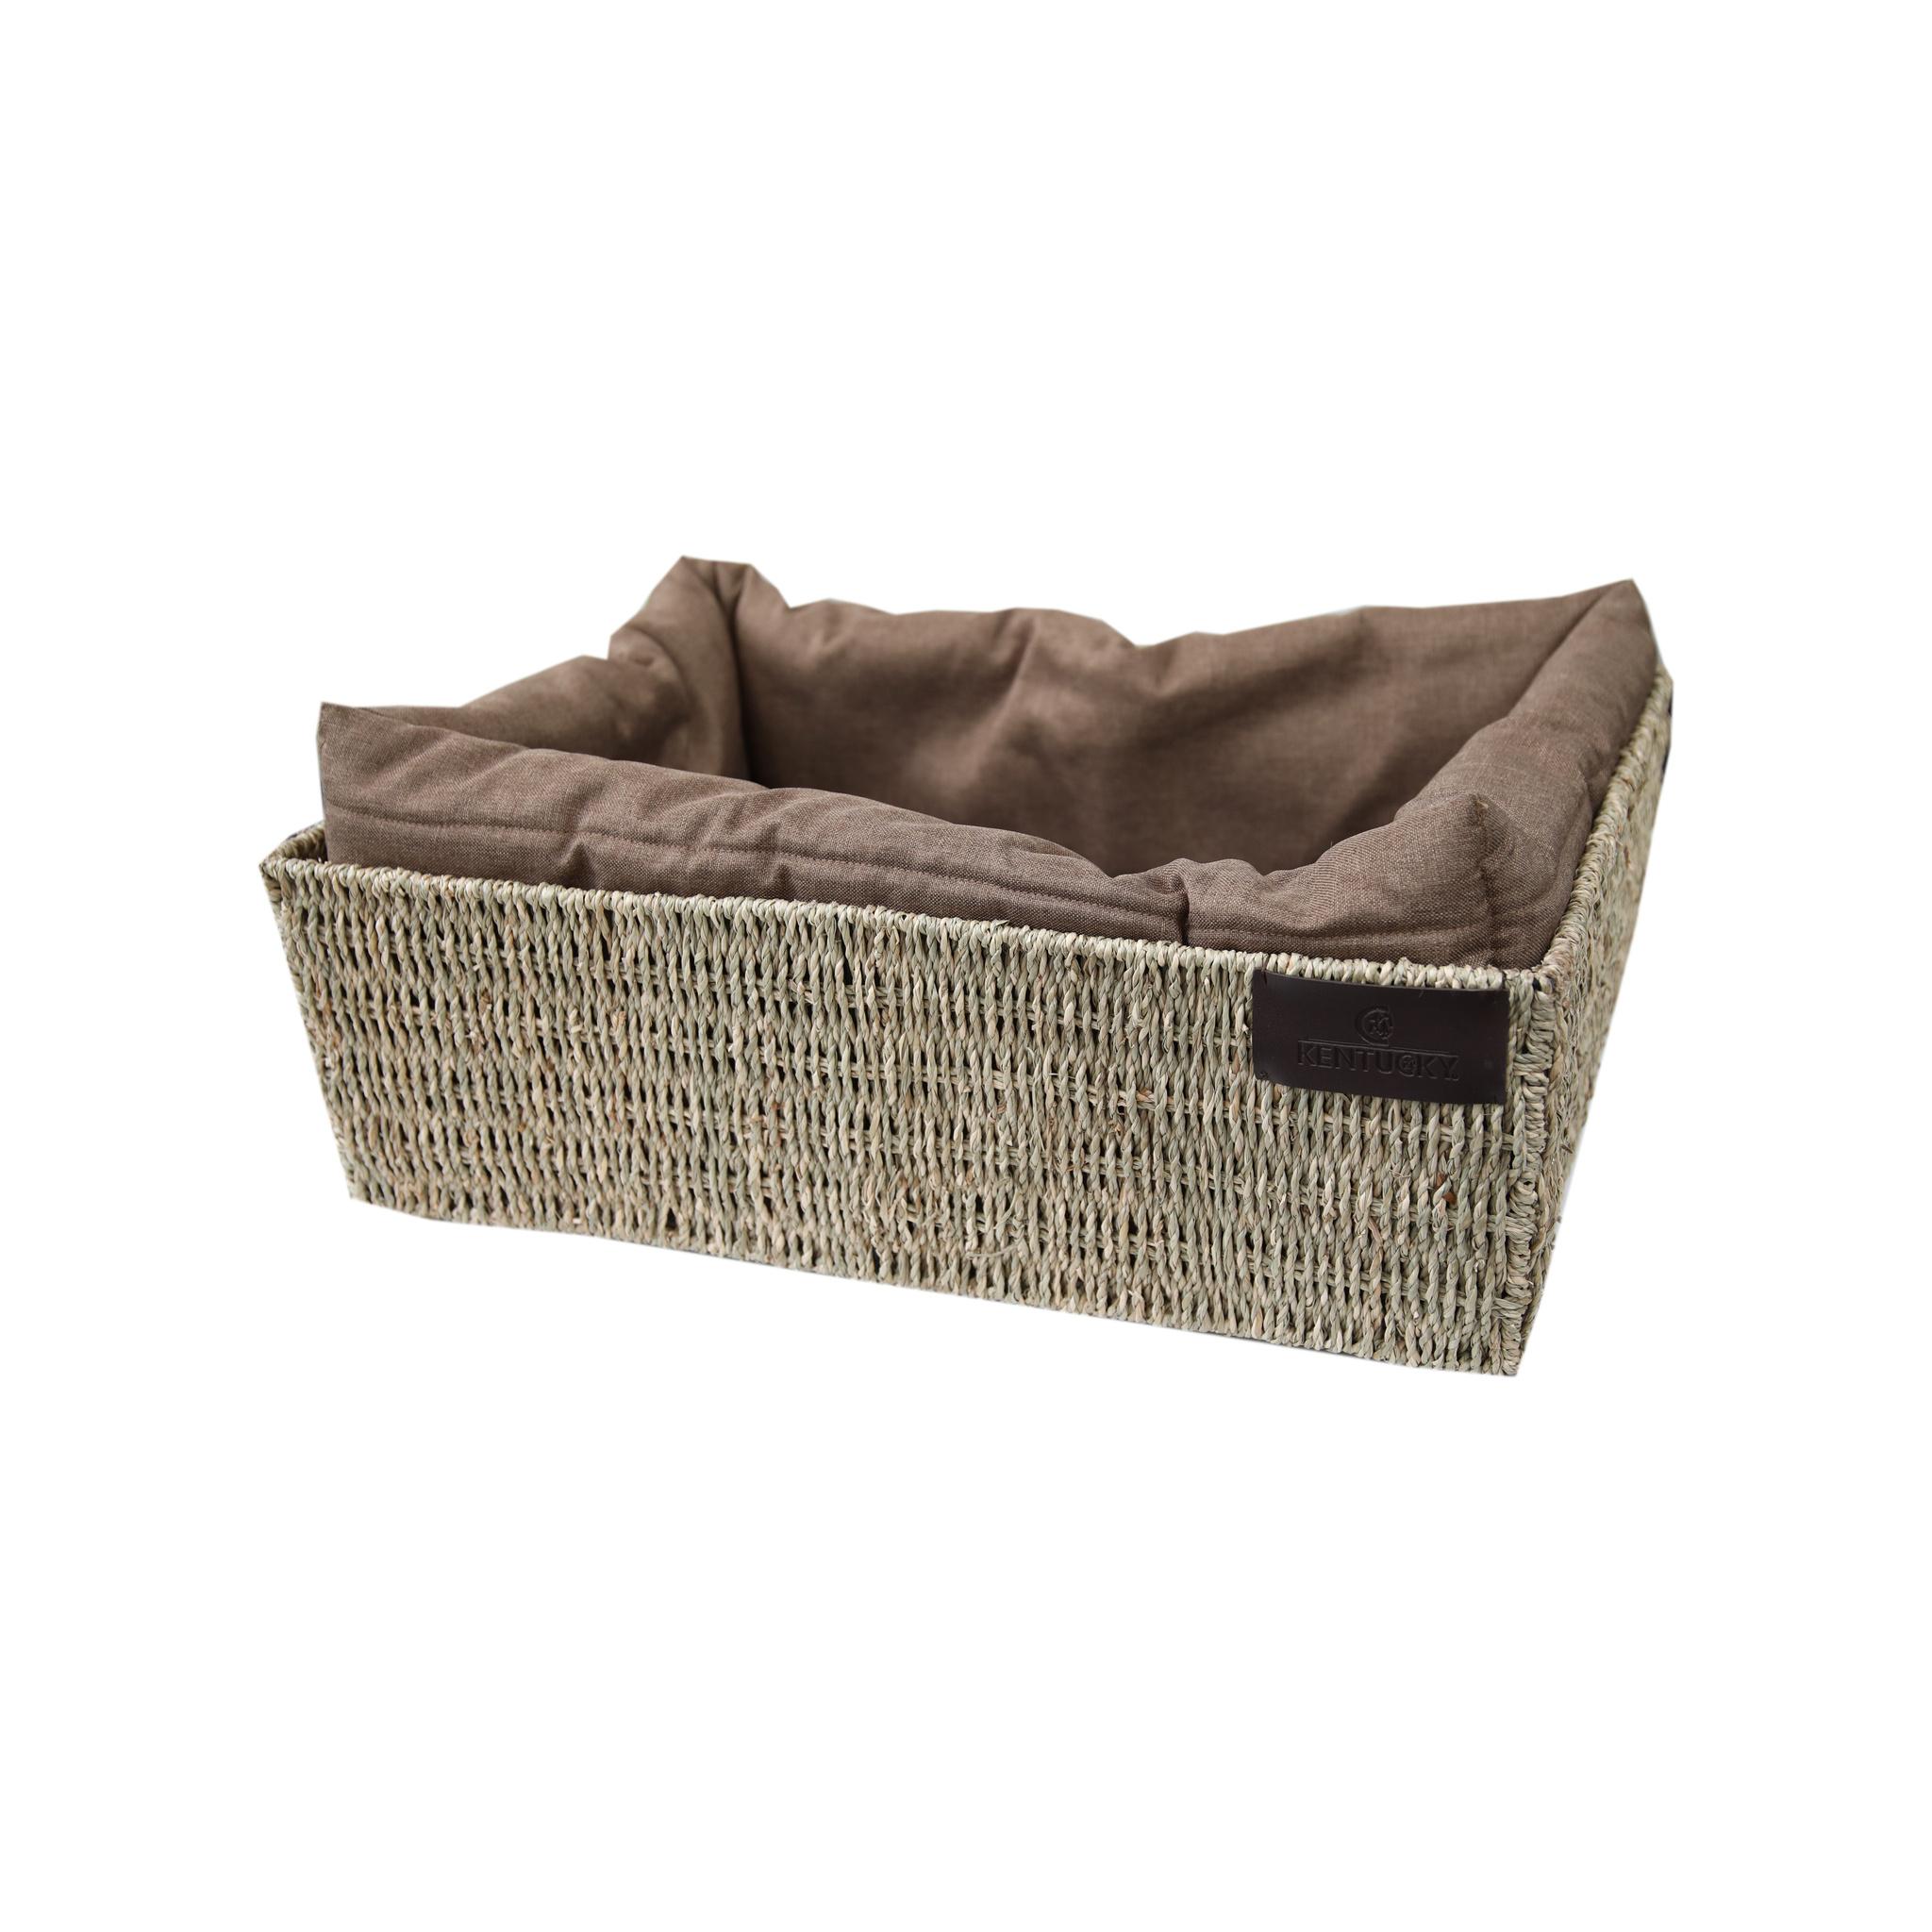 Kentucky Dogwear Basket Dog Bed